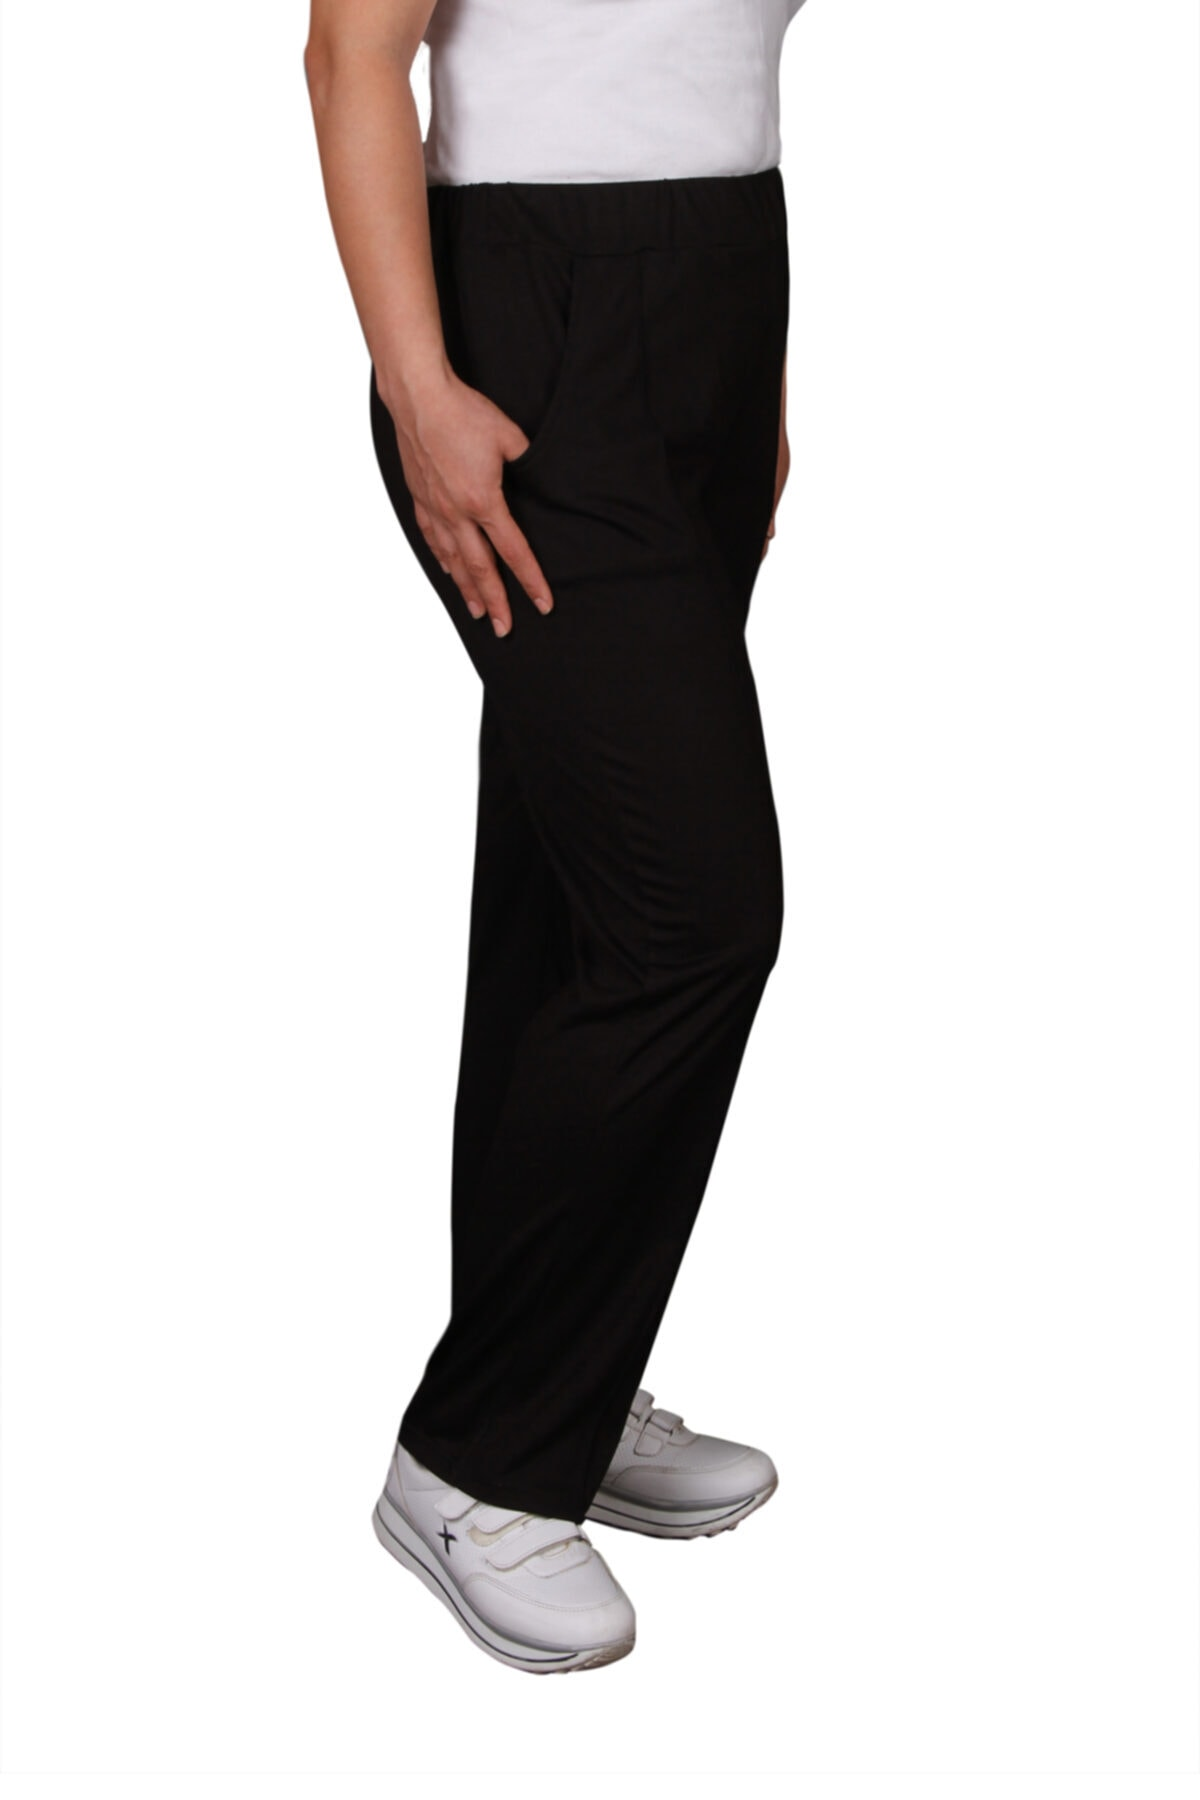 butikxxl Kadın Siyah Rahat  Beli Lastikli Sonbahar Kış Pantolon 2